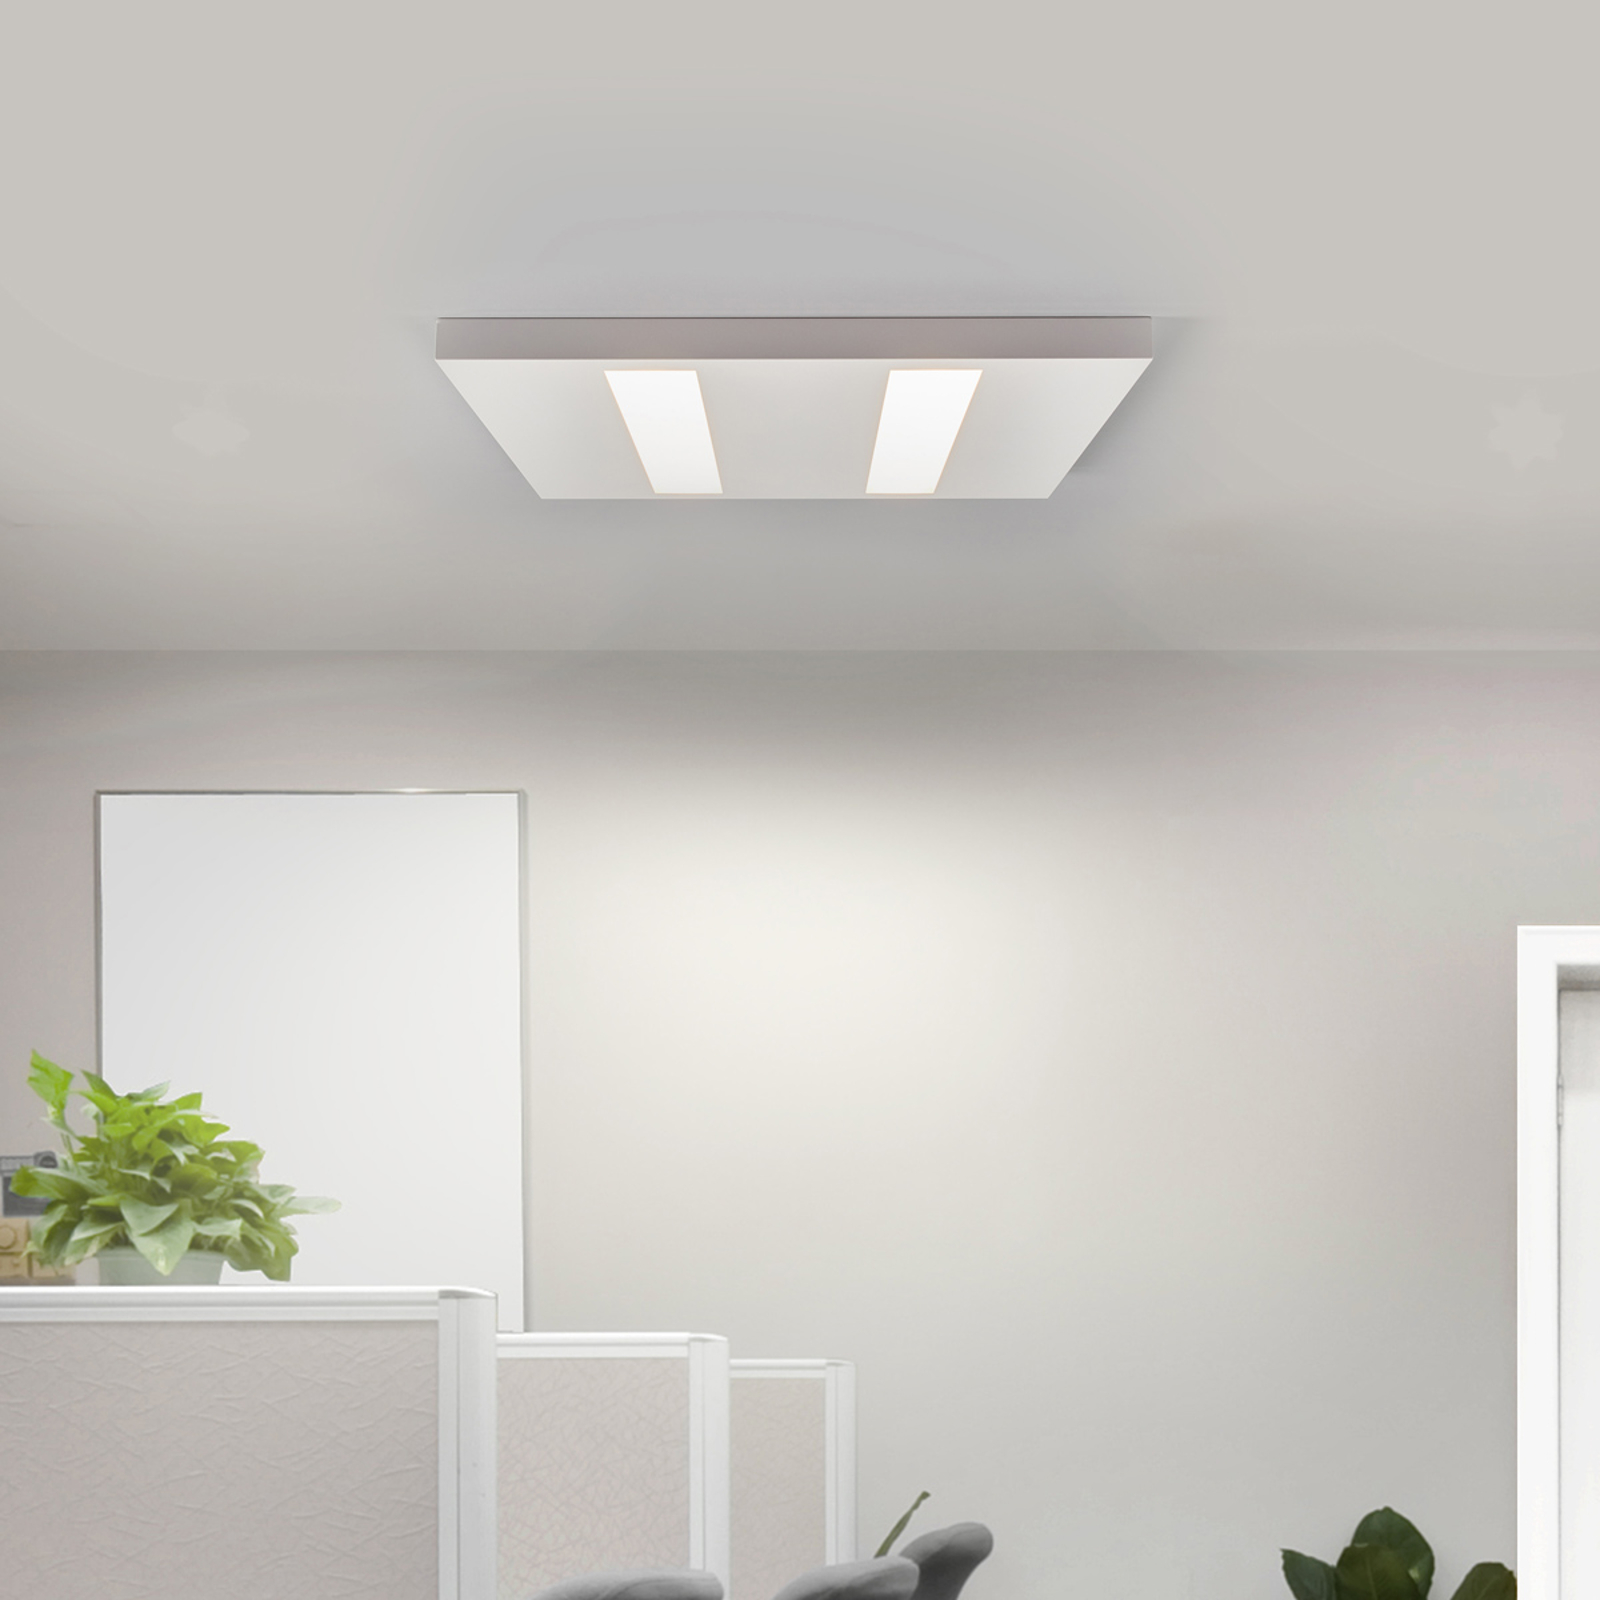 Plafonnier LED plat 37W, blanc, LED Osram